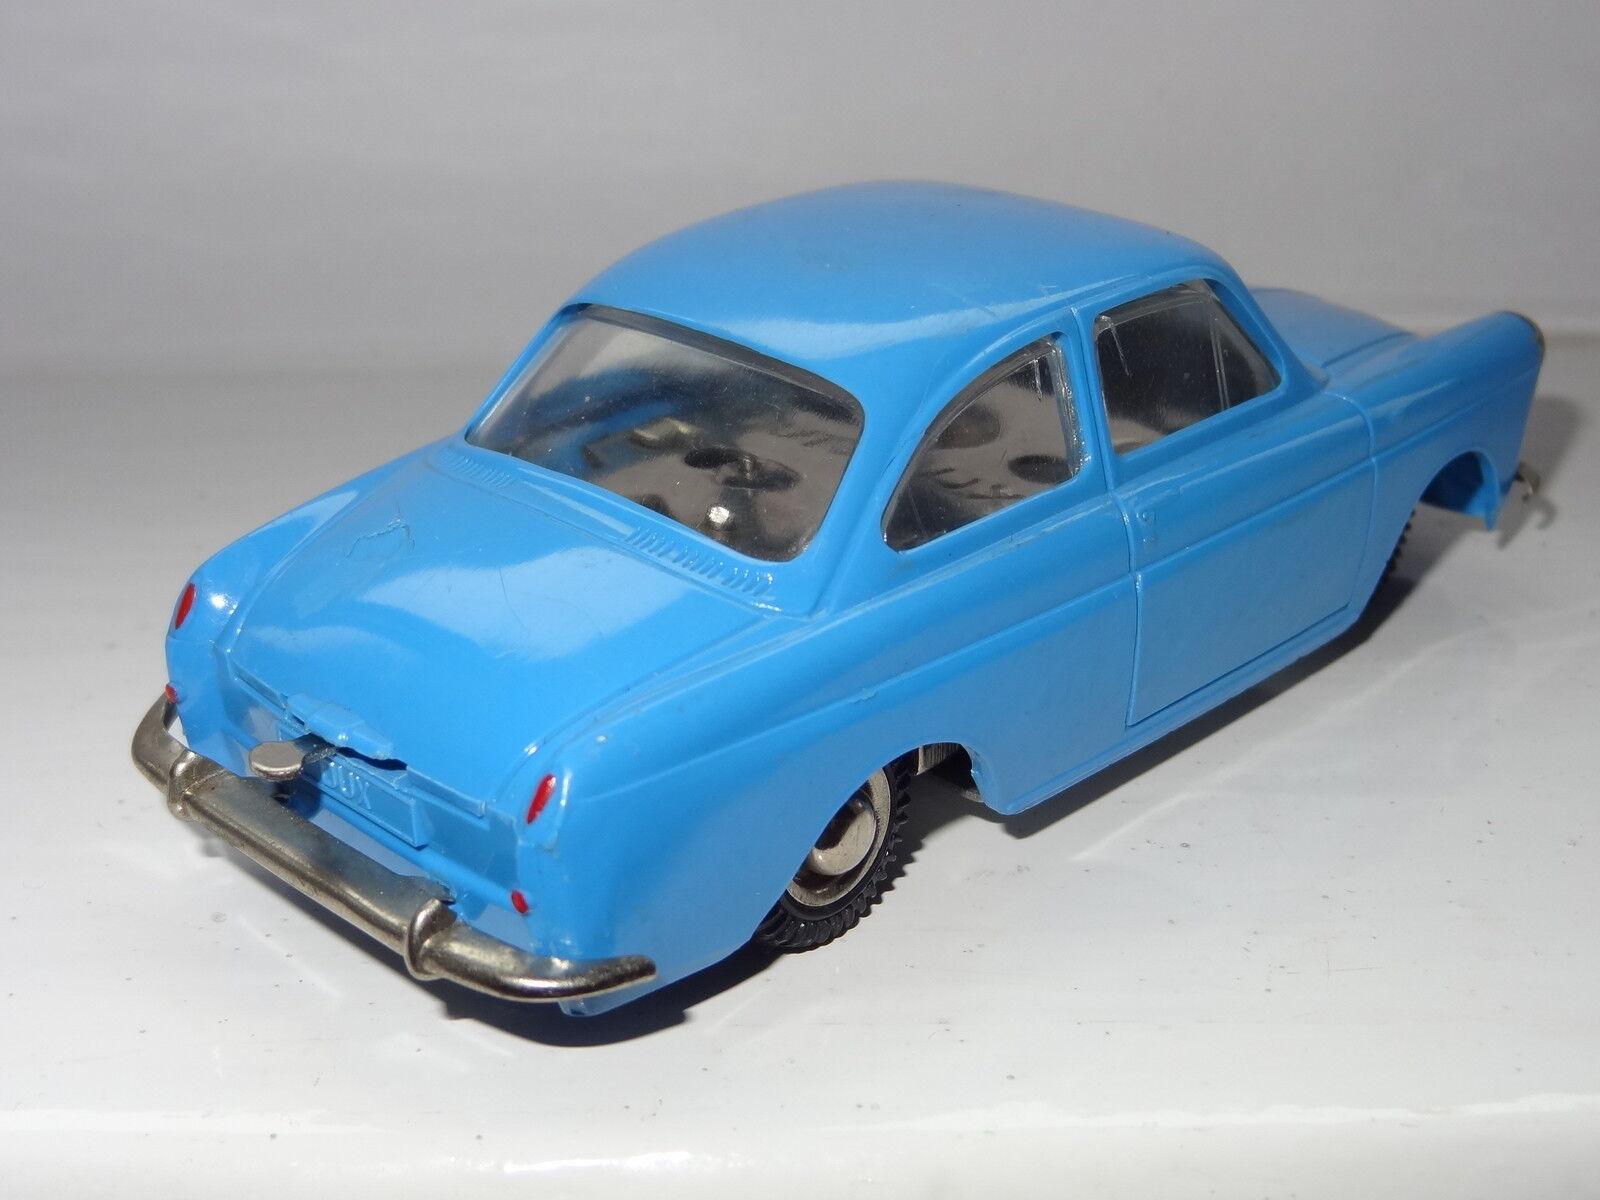 Auto Dux 612 Vw Volkswagen 1500 Wind Up Toy Toy Toy C   adelante & Reversa Alemania ab9cd2